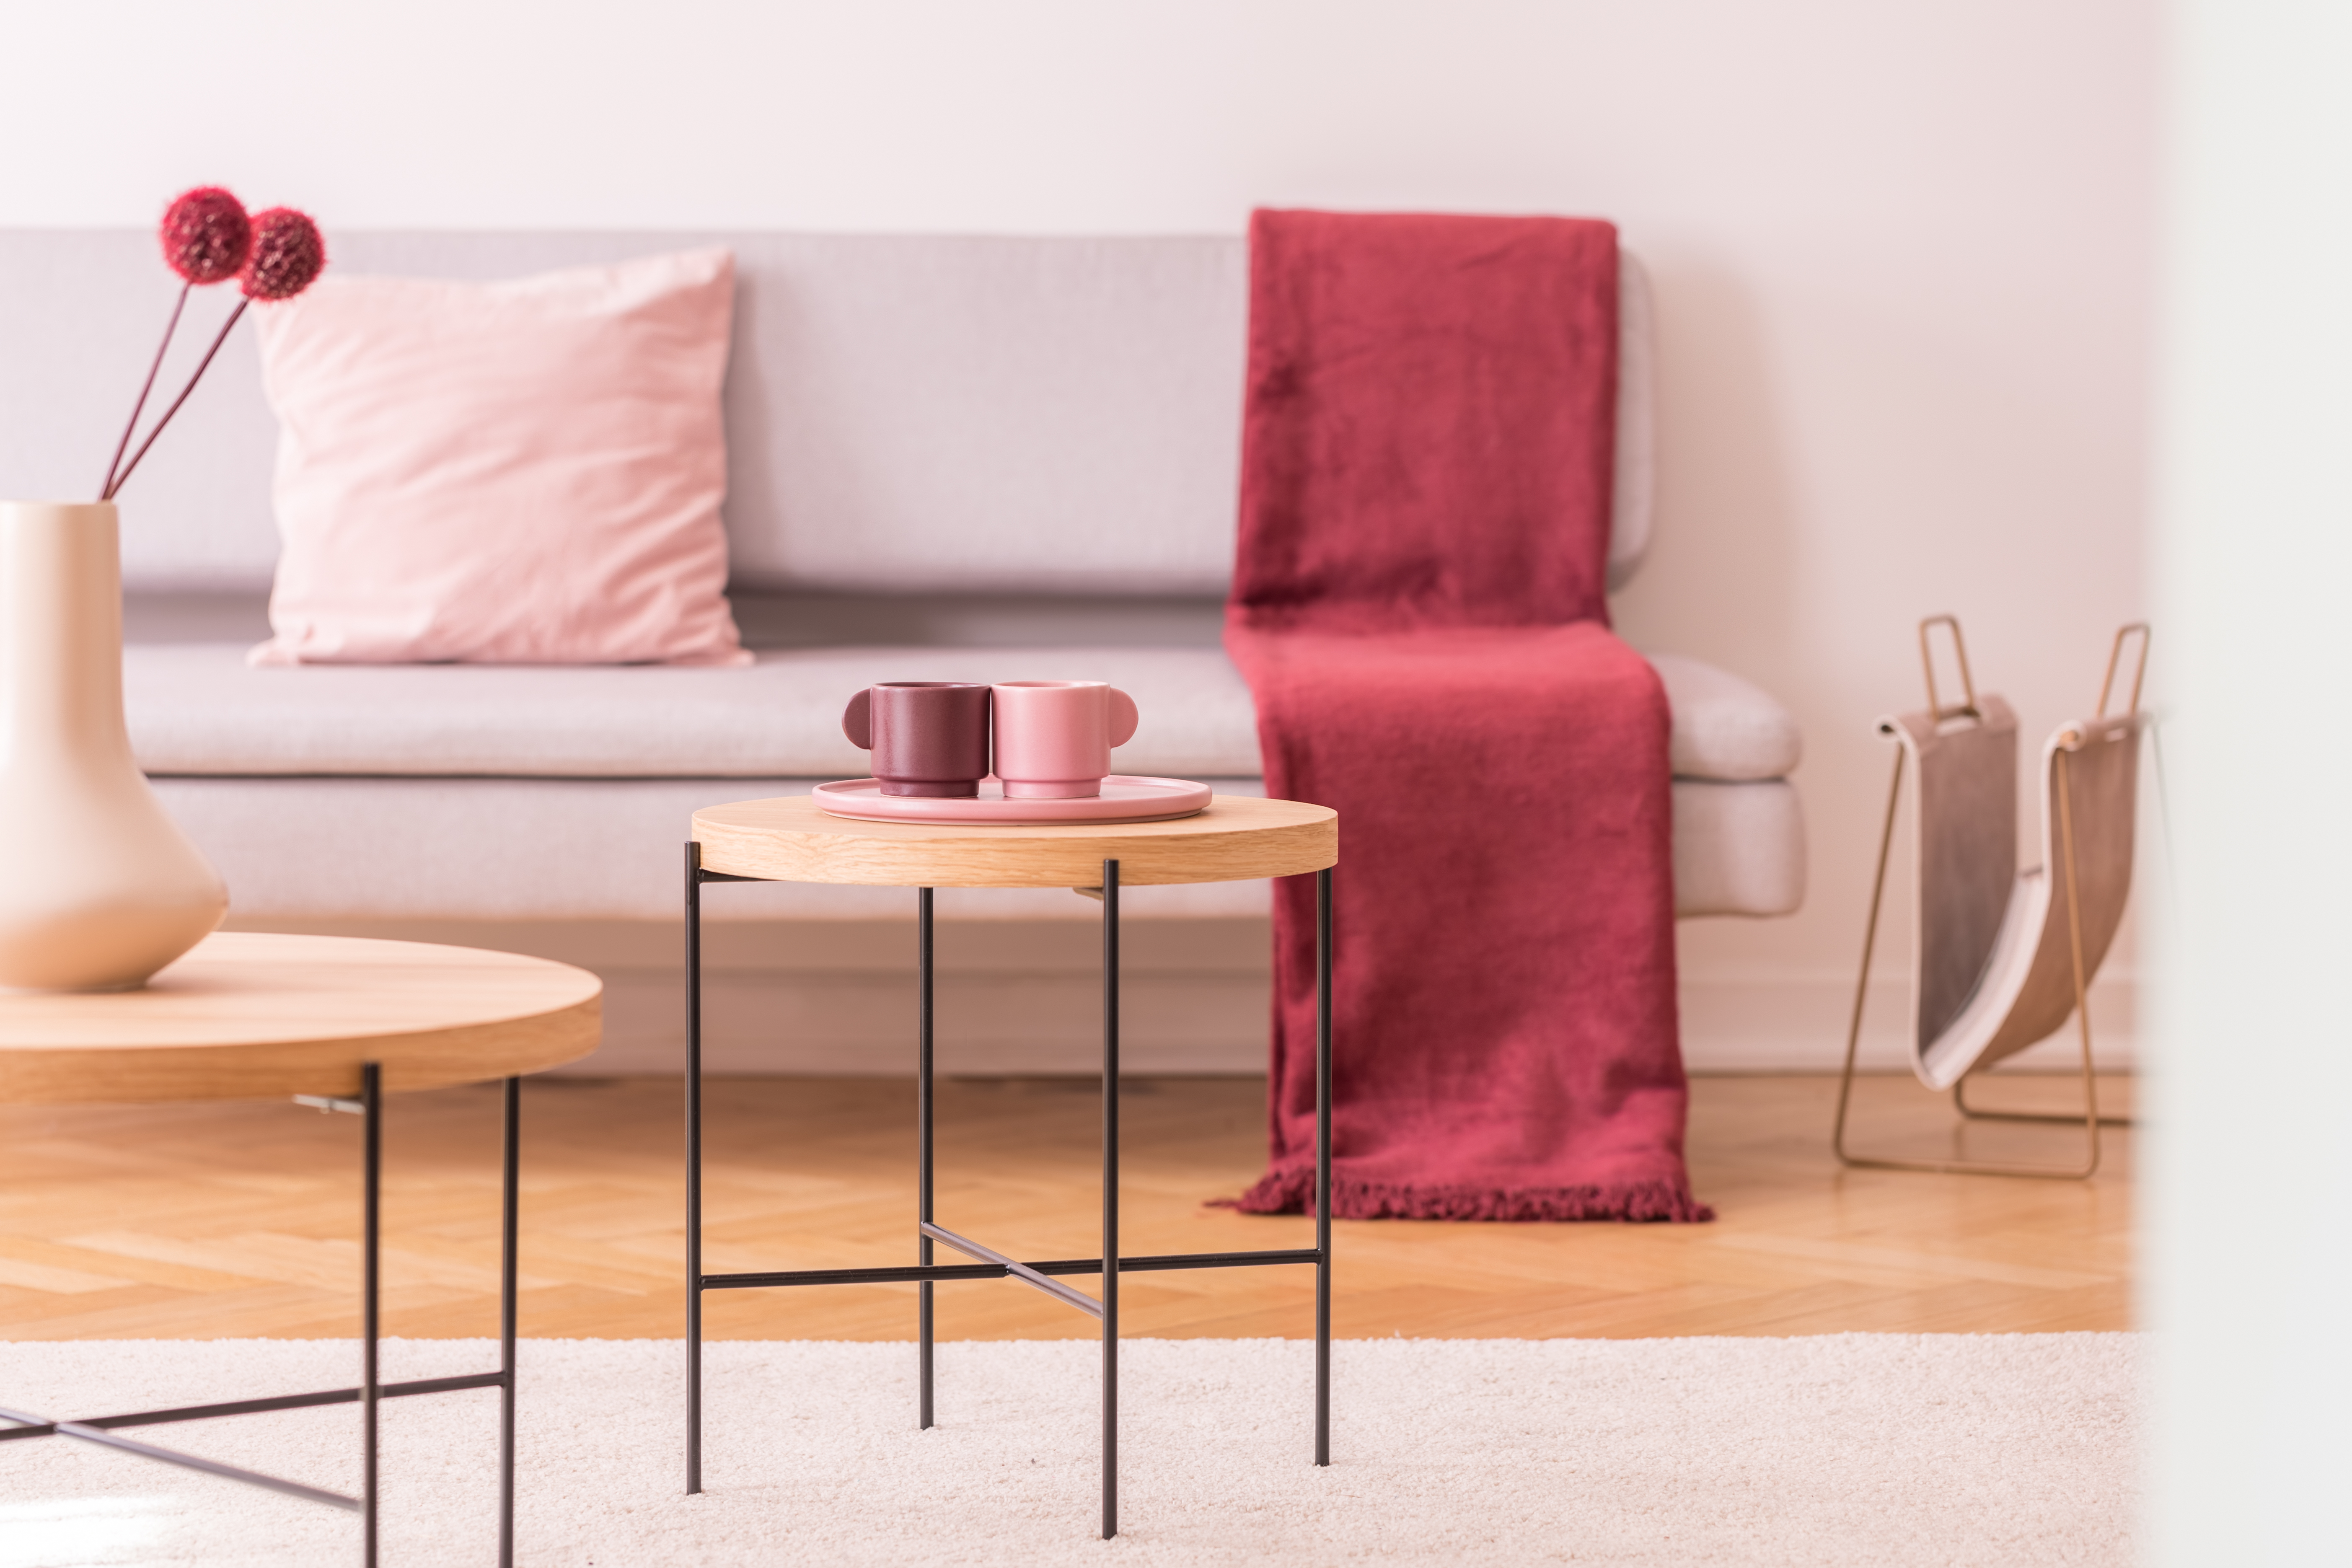 اذواق انثويه في الديكور الداخلي Flowers-and-cups-on-wooden-tables-in-living-room-i-mte4czy